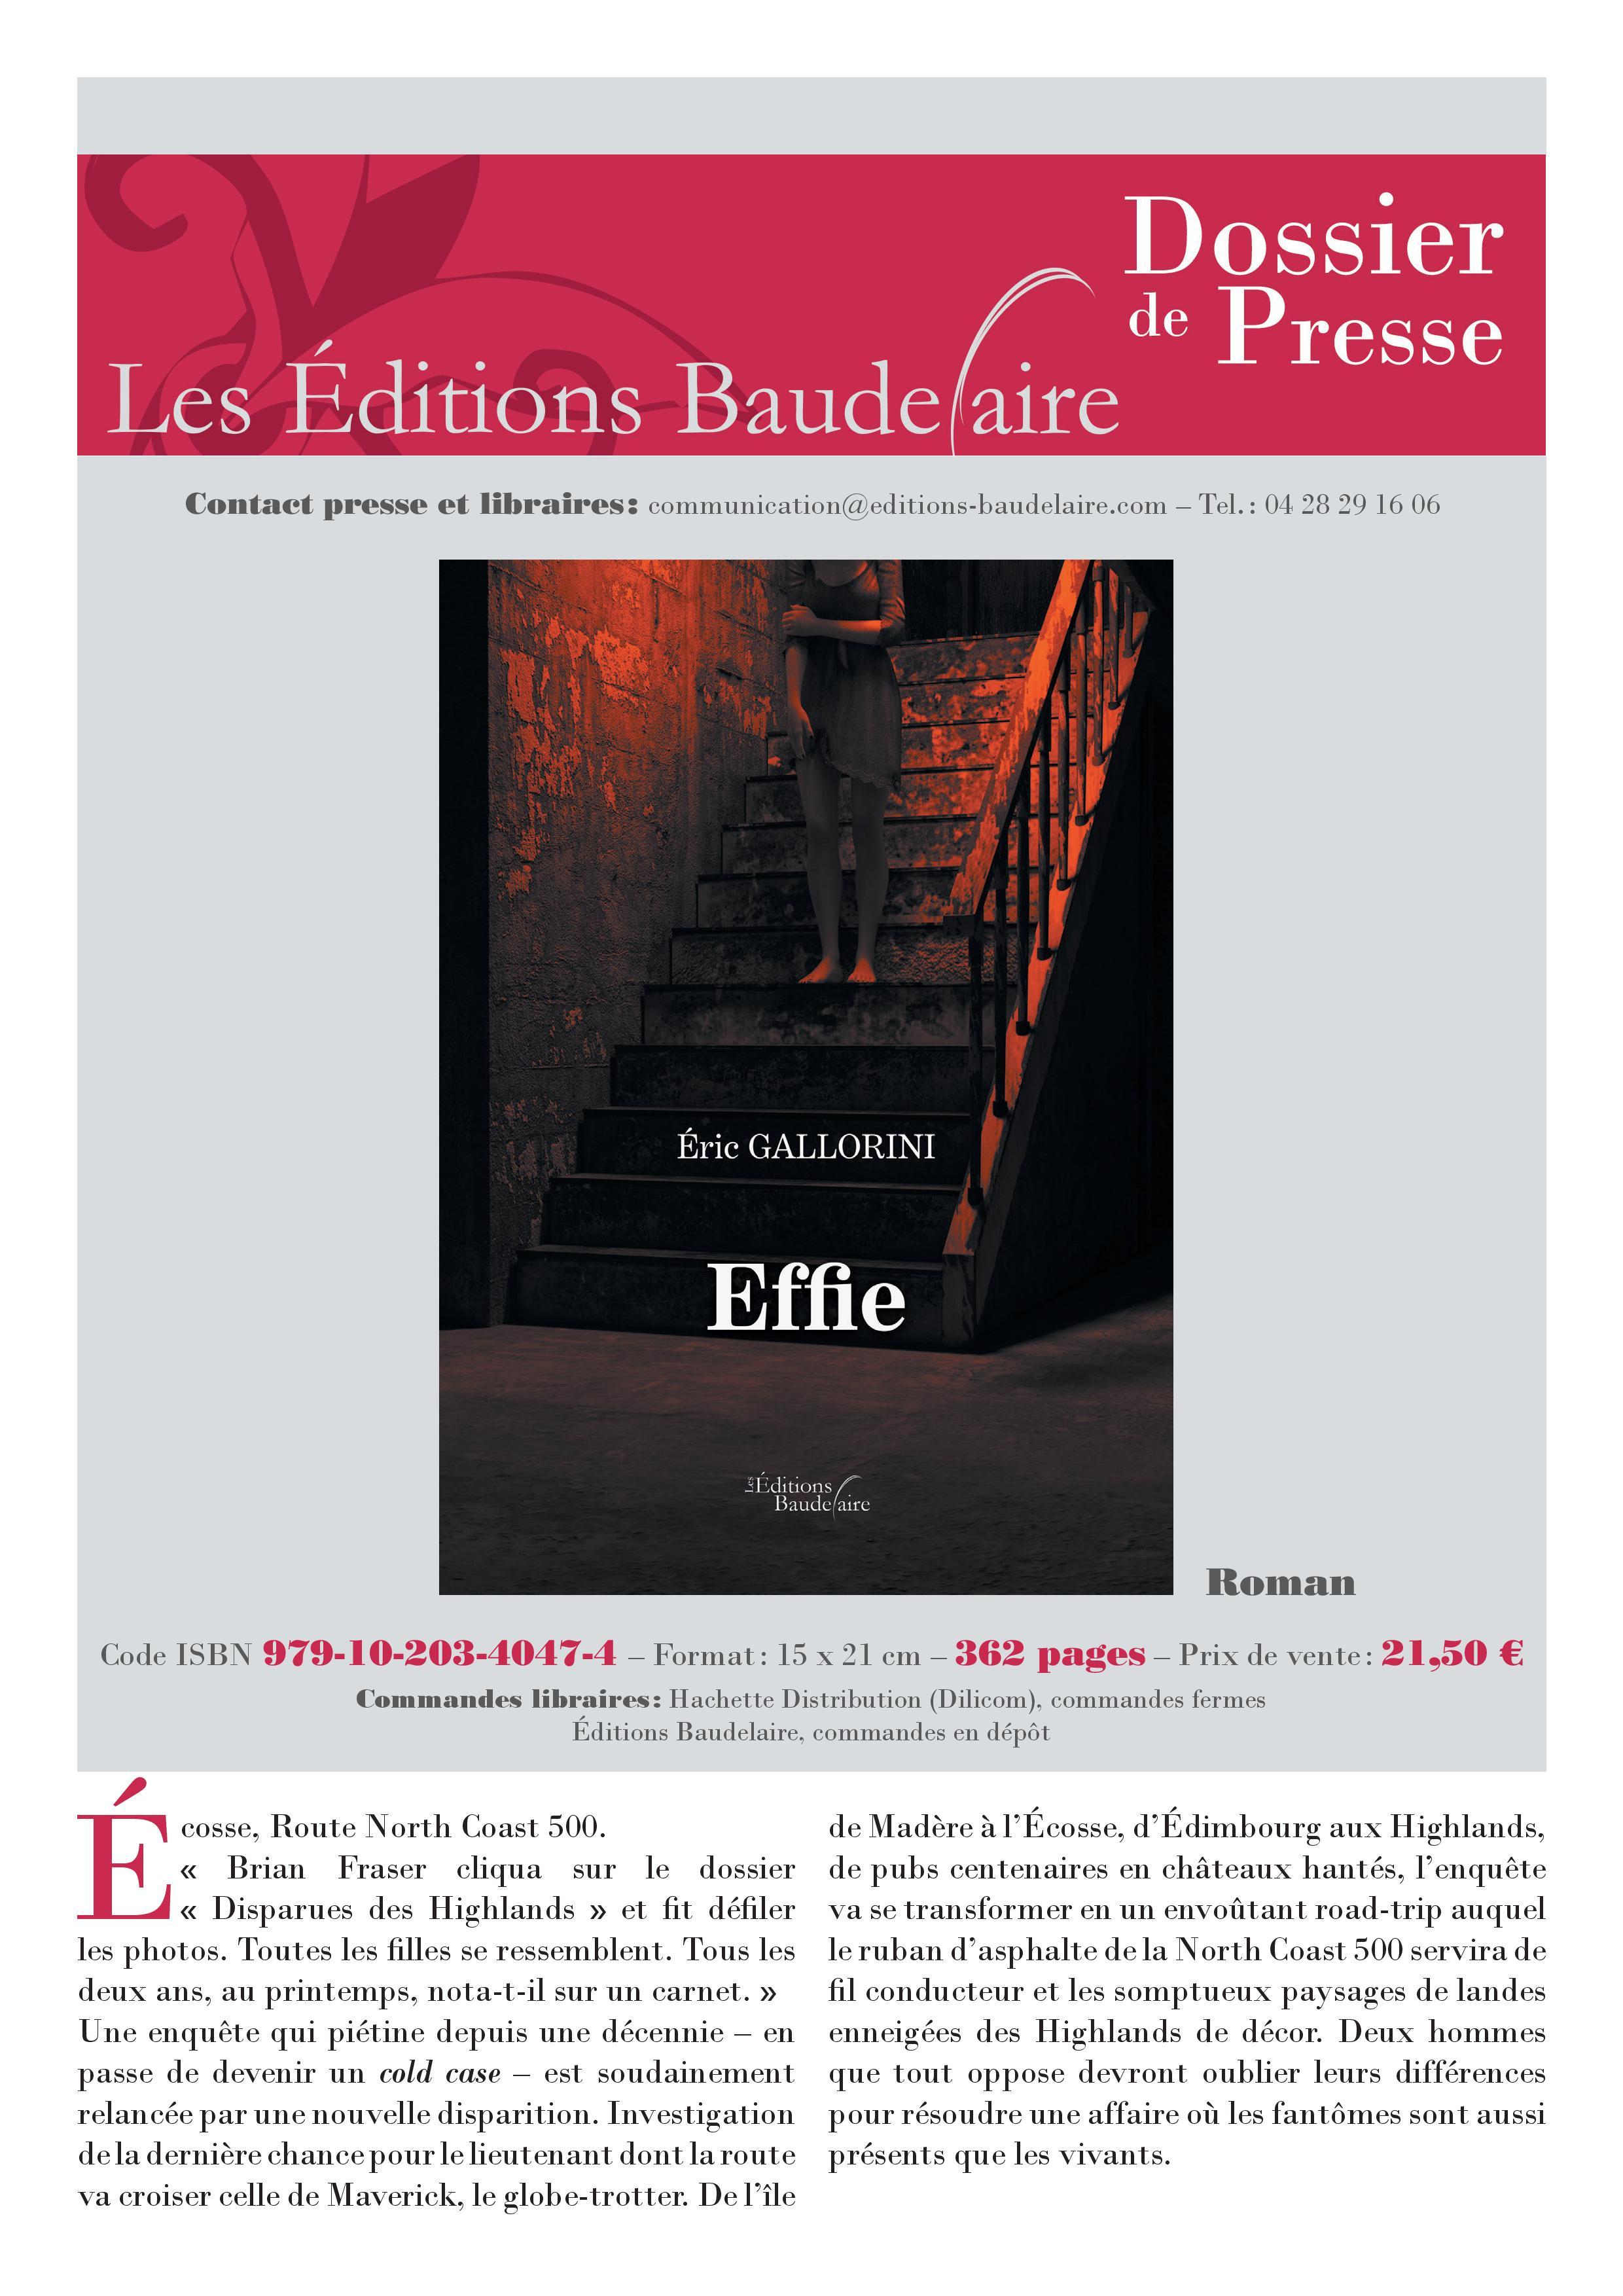 Dossier de presse Effie-page-001.jpg